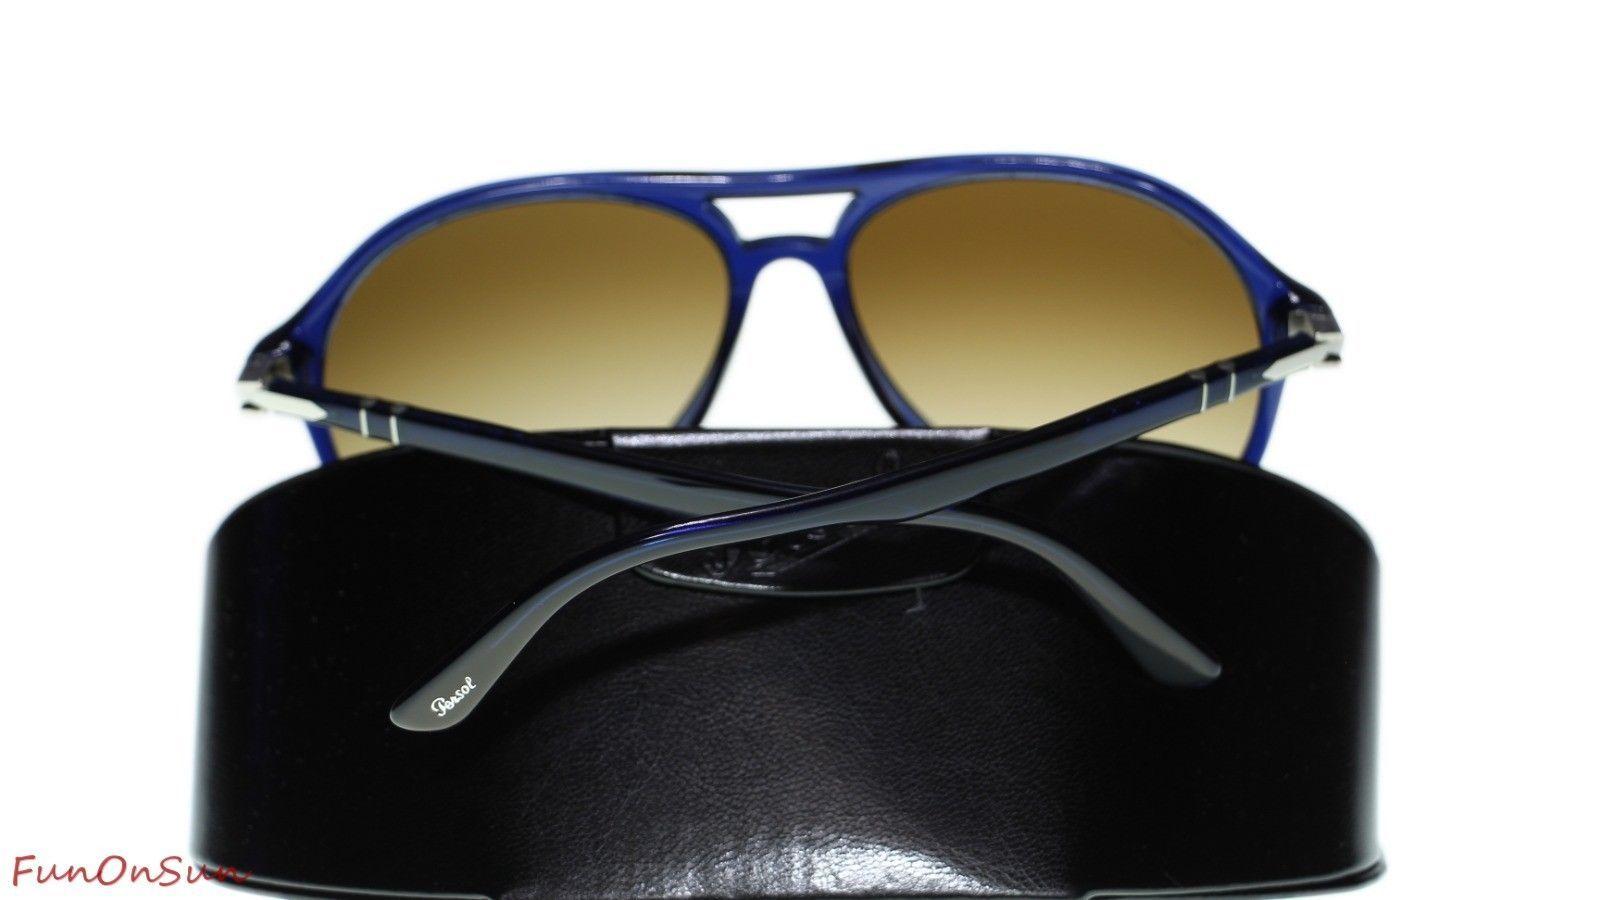 c9d6daa8c1f82 Persol Mens Sunglasses PO3194S 107451 Blue Clear Gradient Brown Lens Pilot  59mm